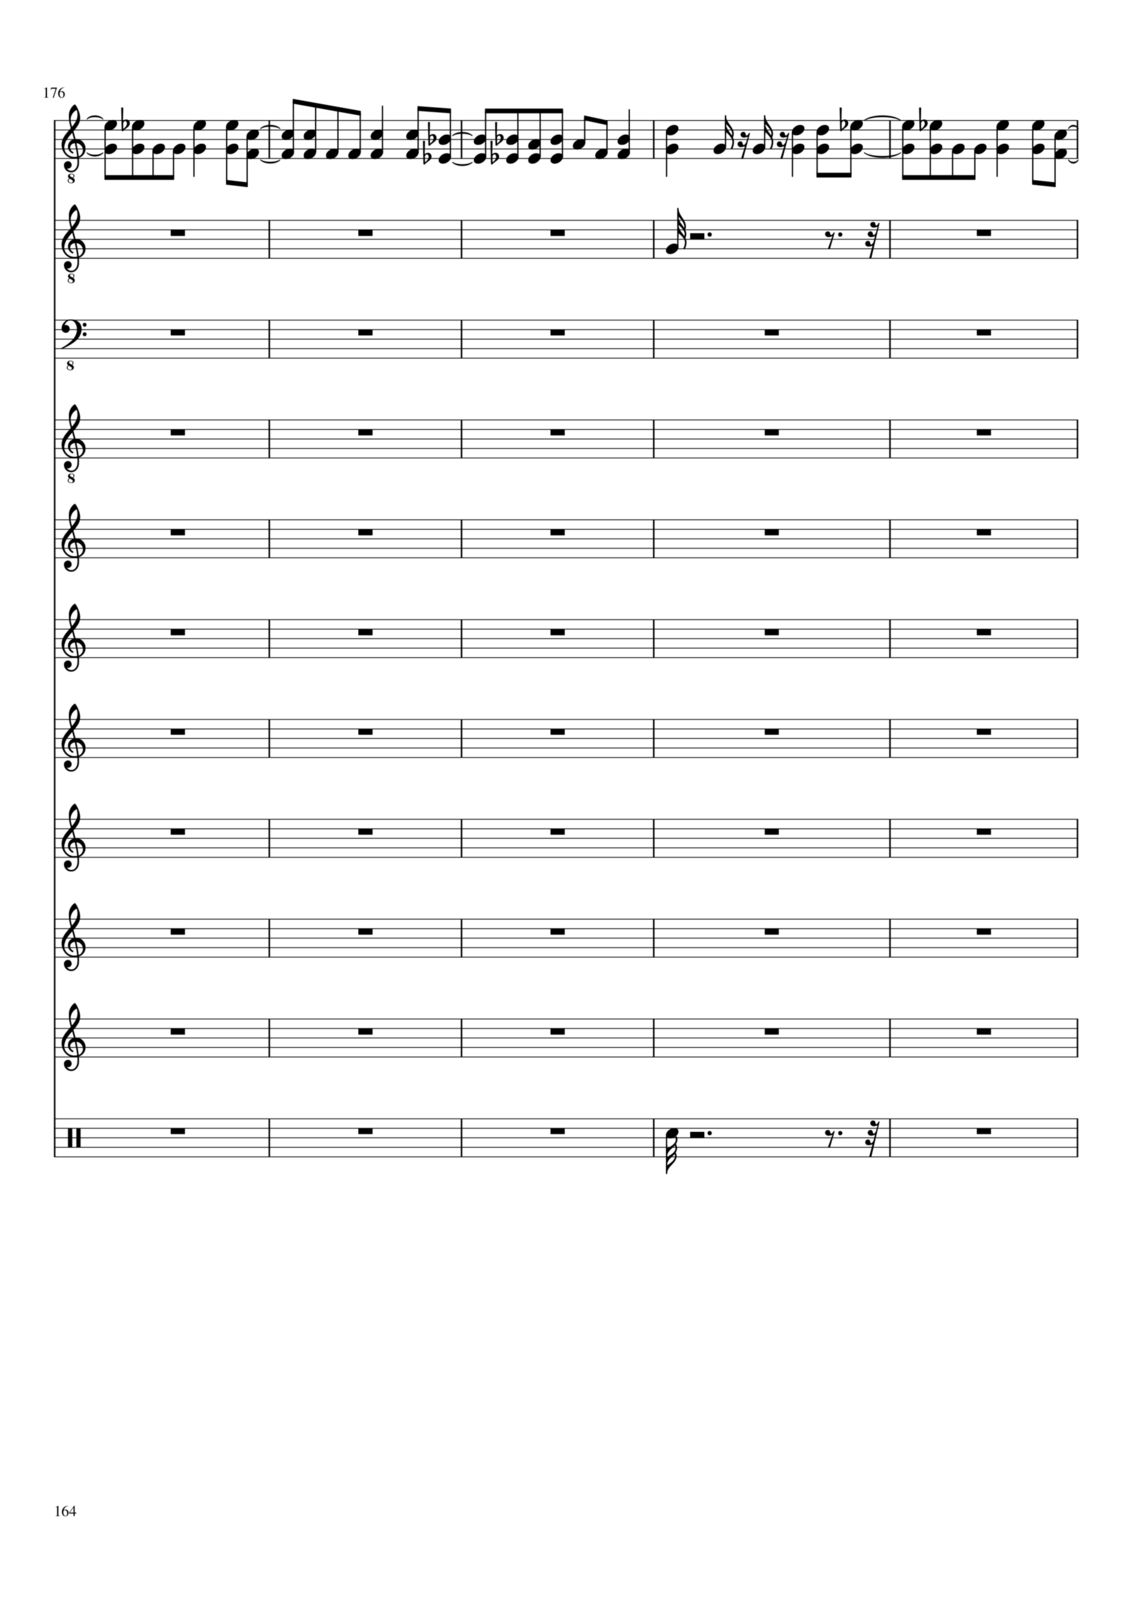 Belyiy sokol slide, Image 164